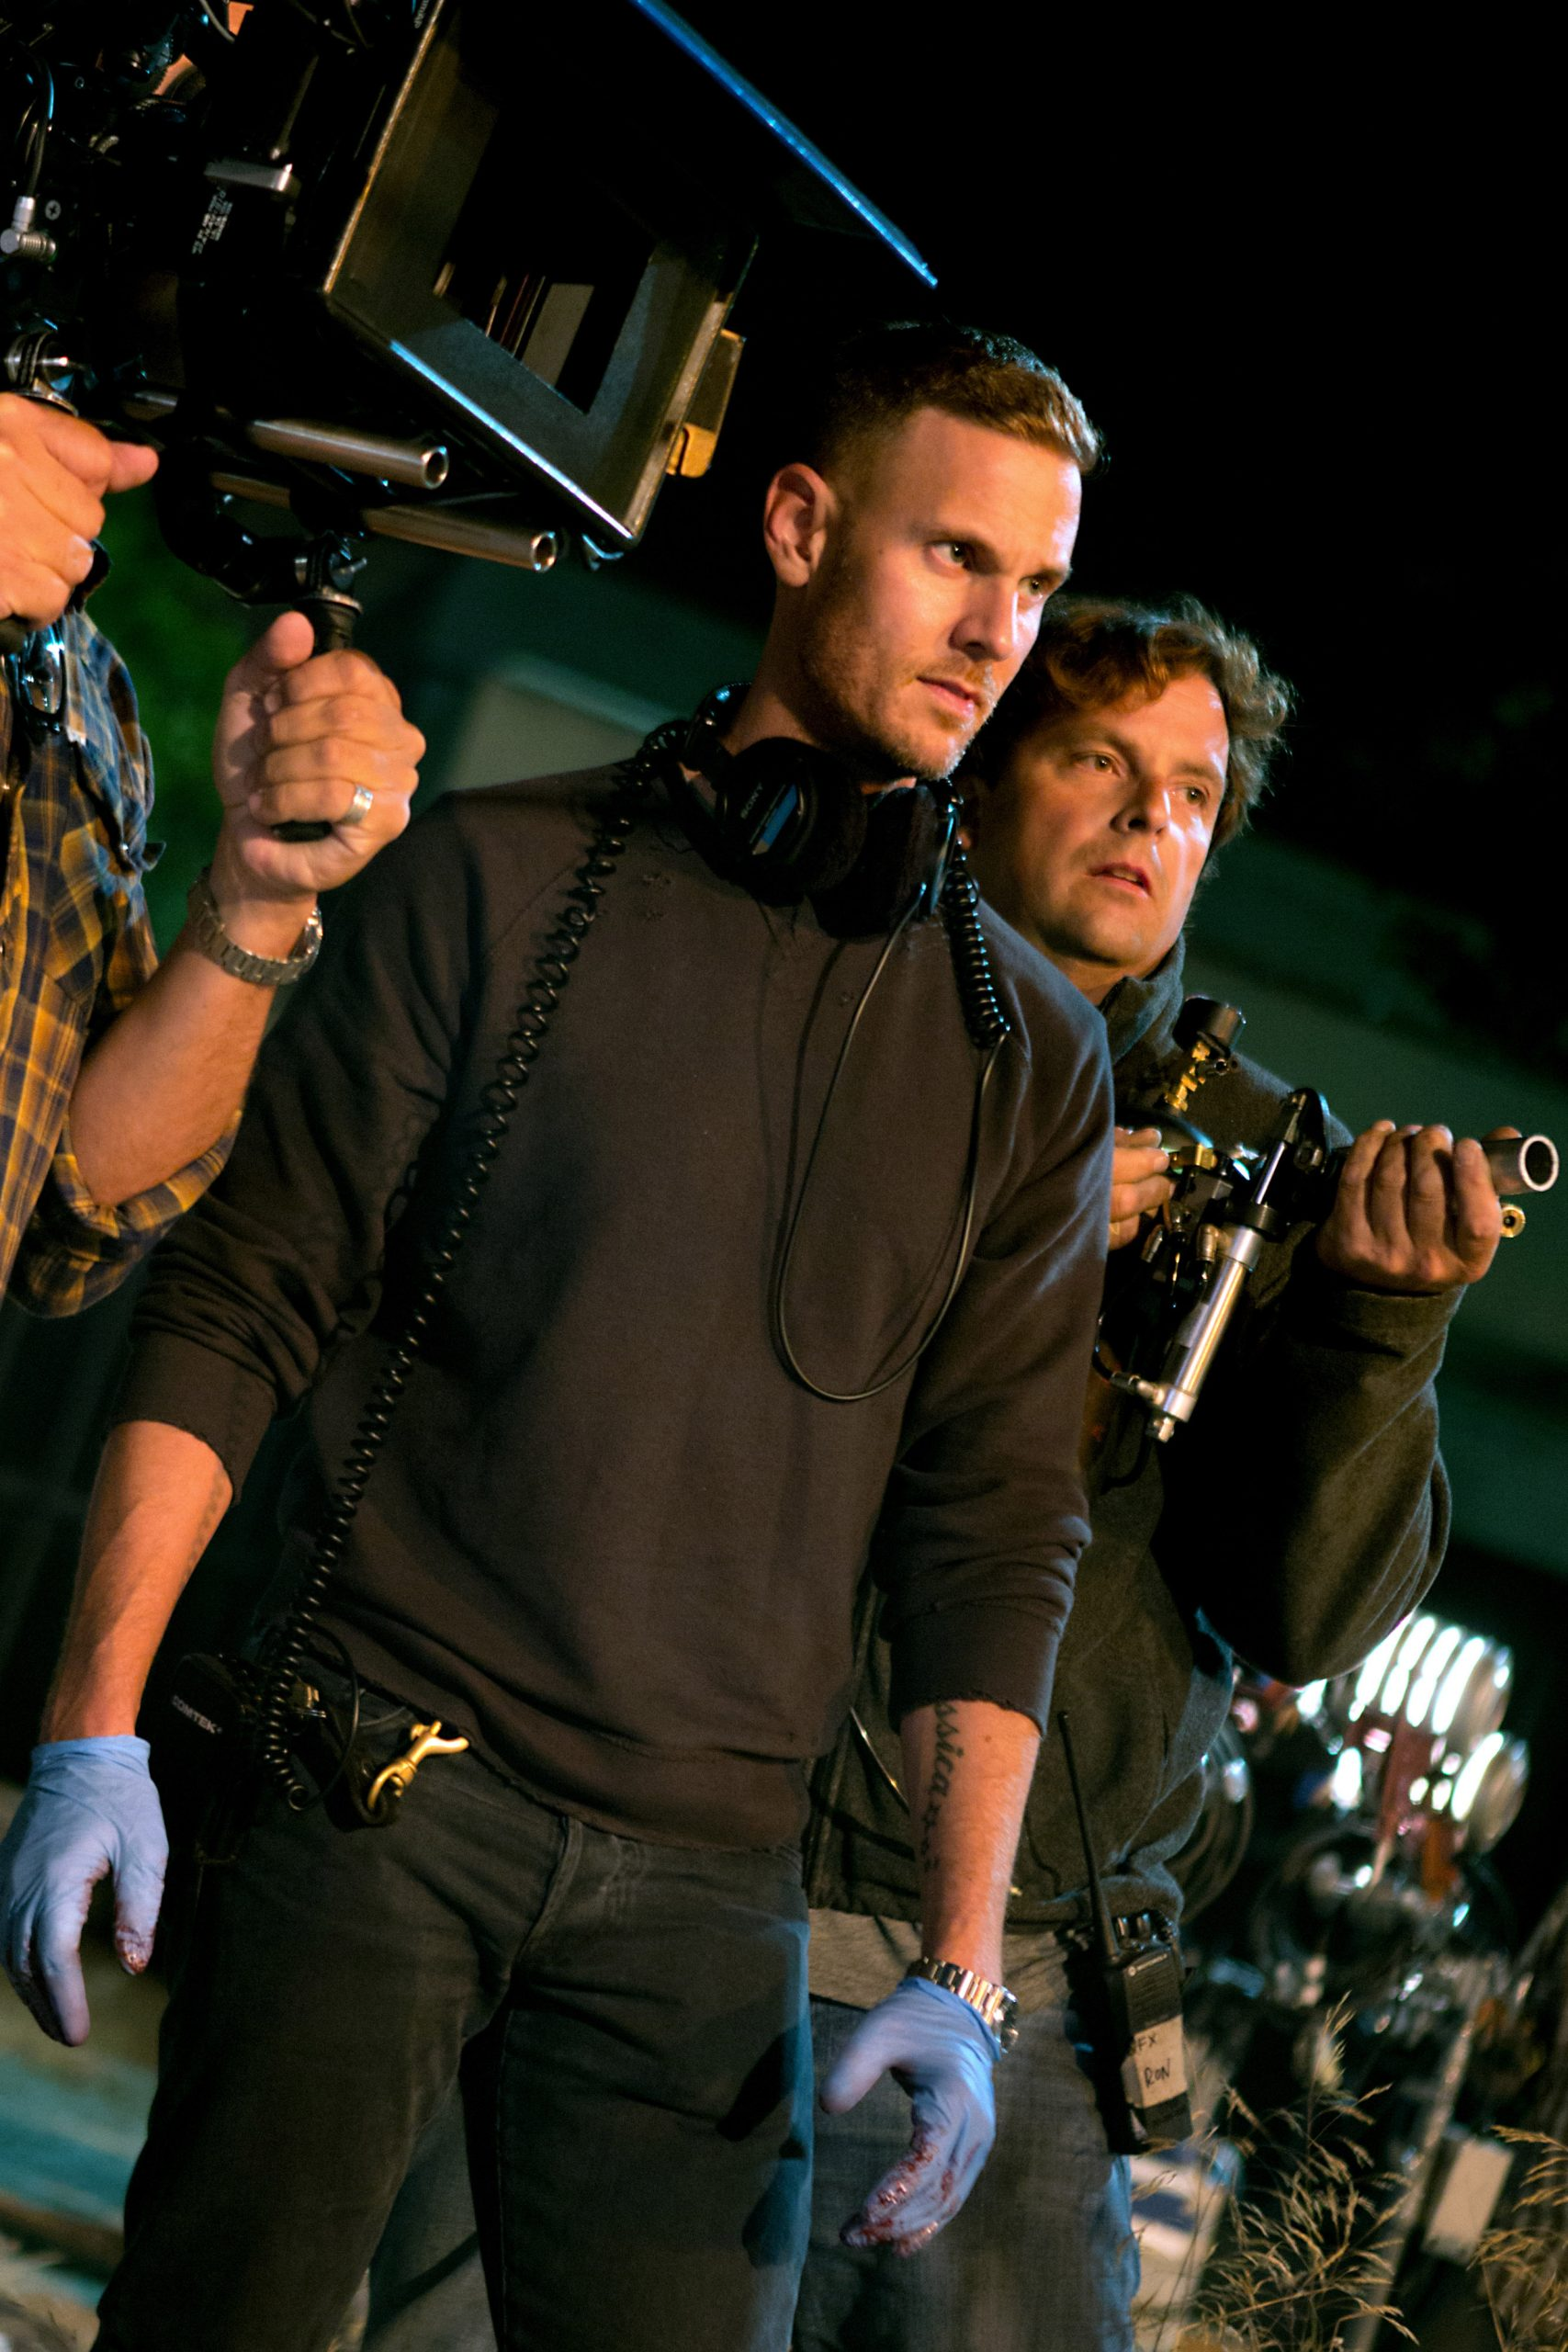 SCOUTS GUIDE TO THE ZOMBIE APOCALYPSE, (aka SCOUT'S GUIDE TO THE ZOMBIE APOCALYPSE), director Christopher Landon, on set, 2015